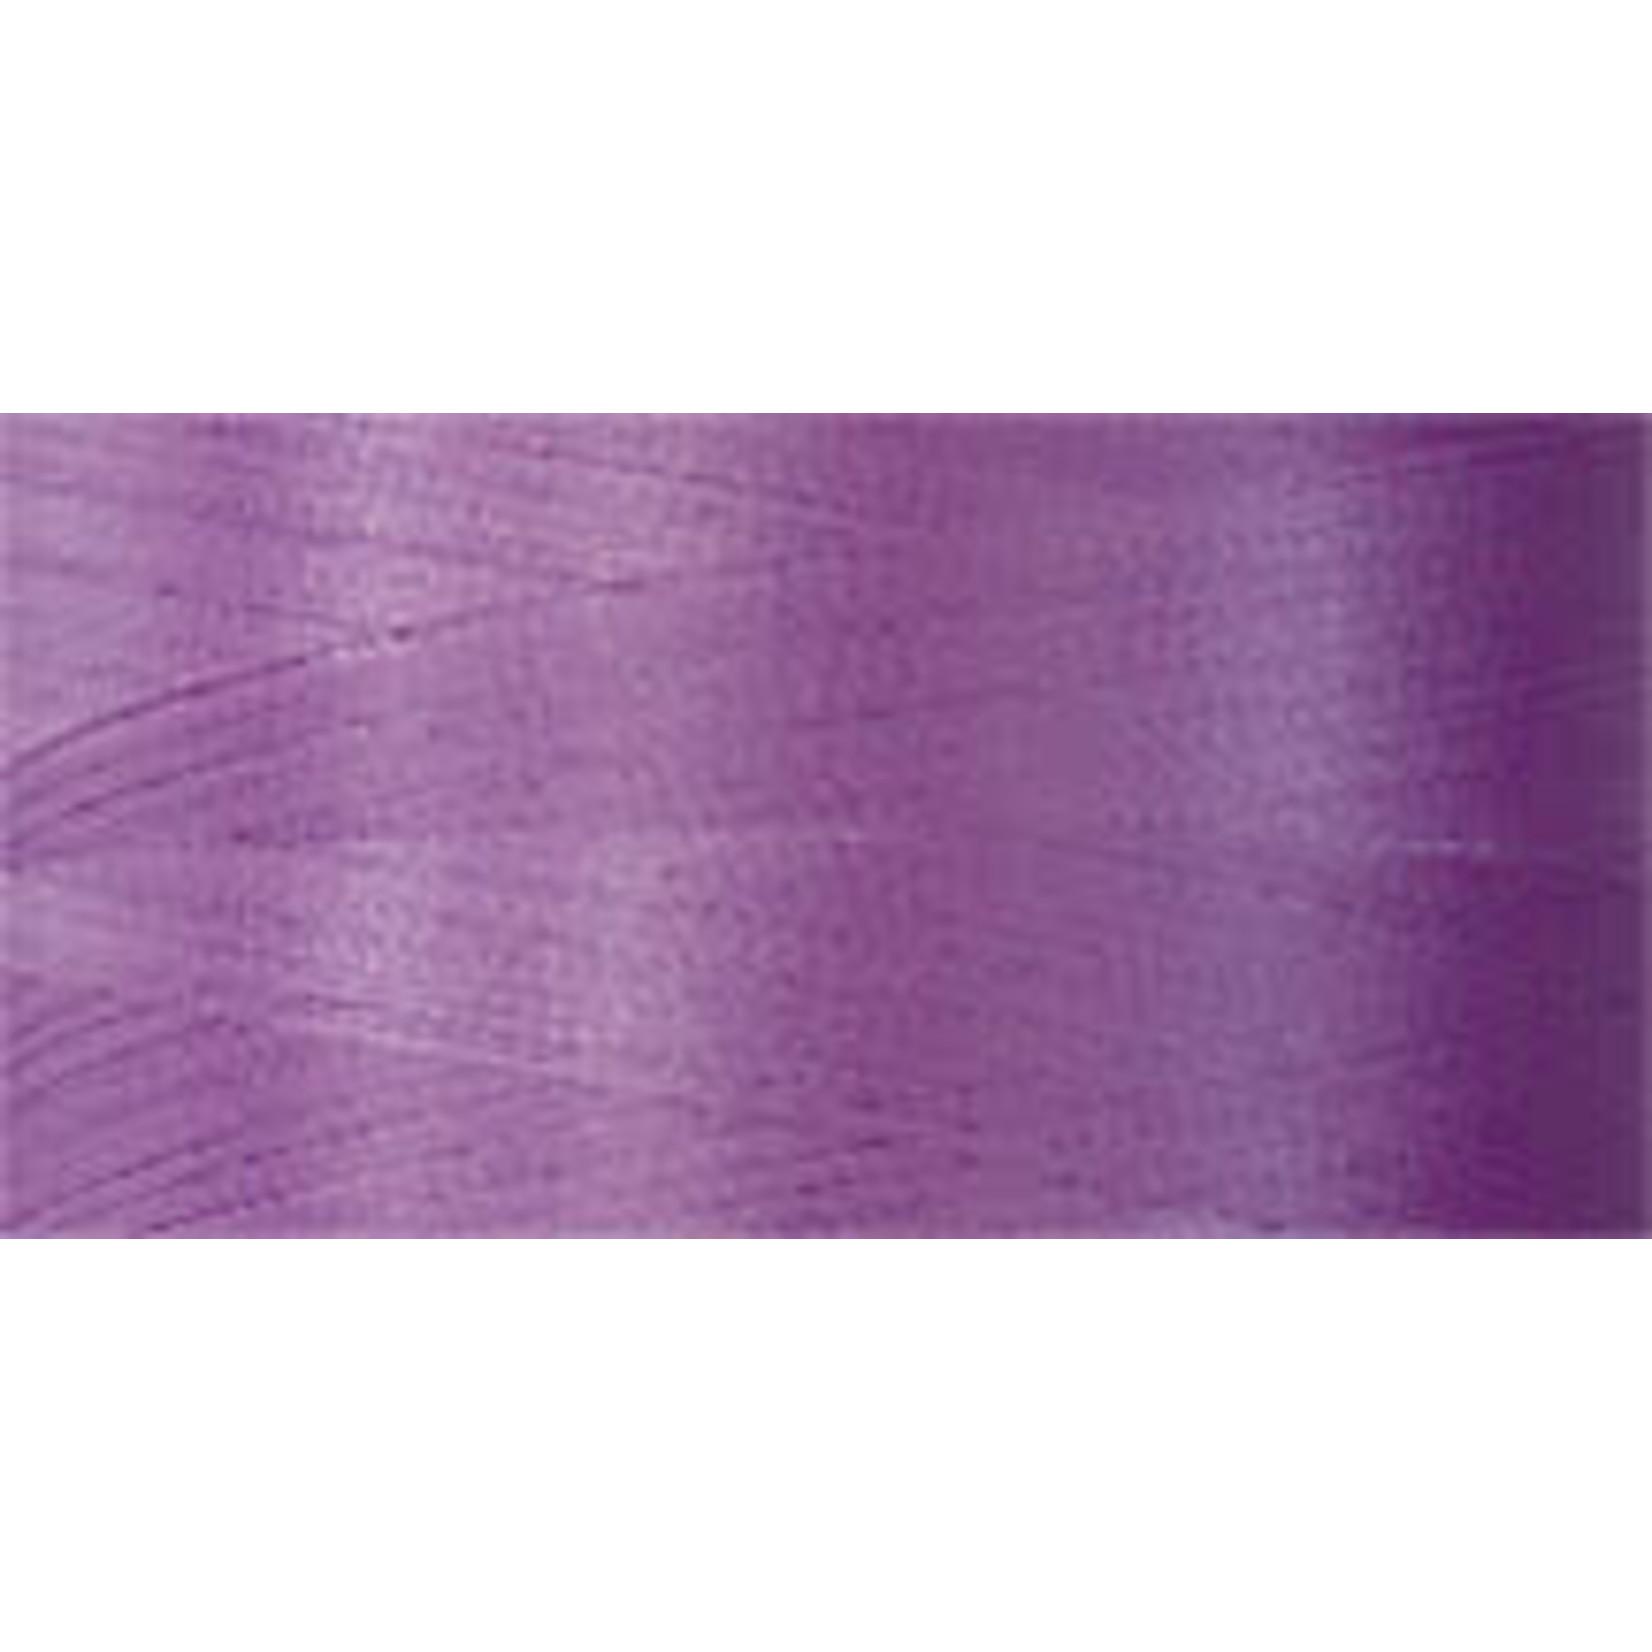 Superior Threads Bottom Line - #60 - 1300 m - 607 Light Purple